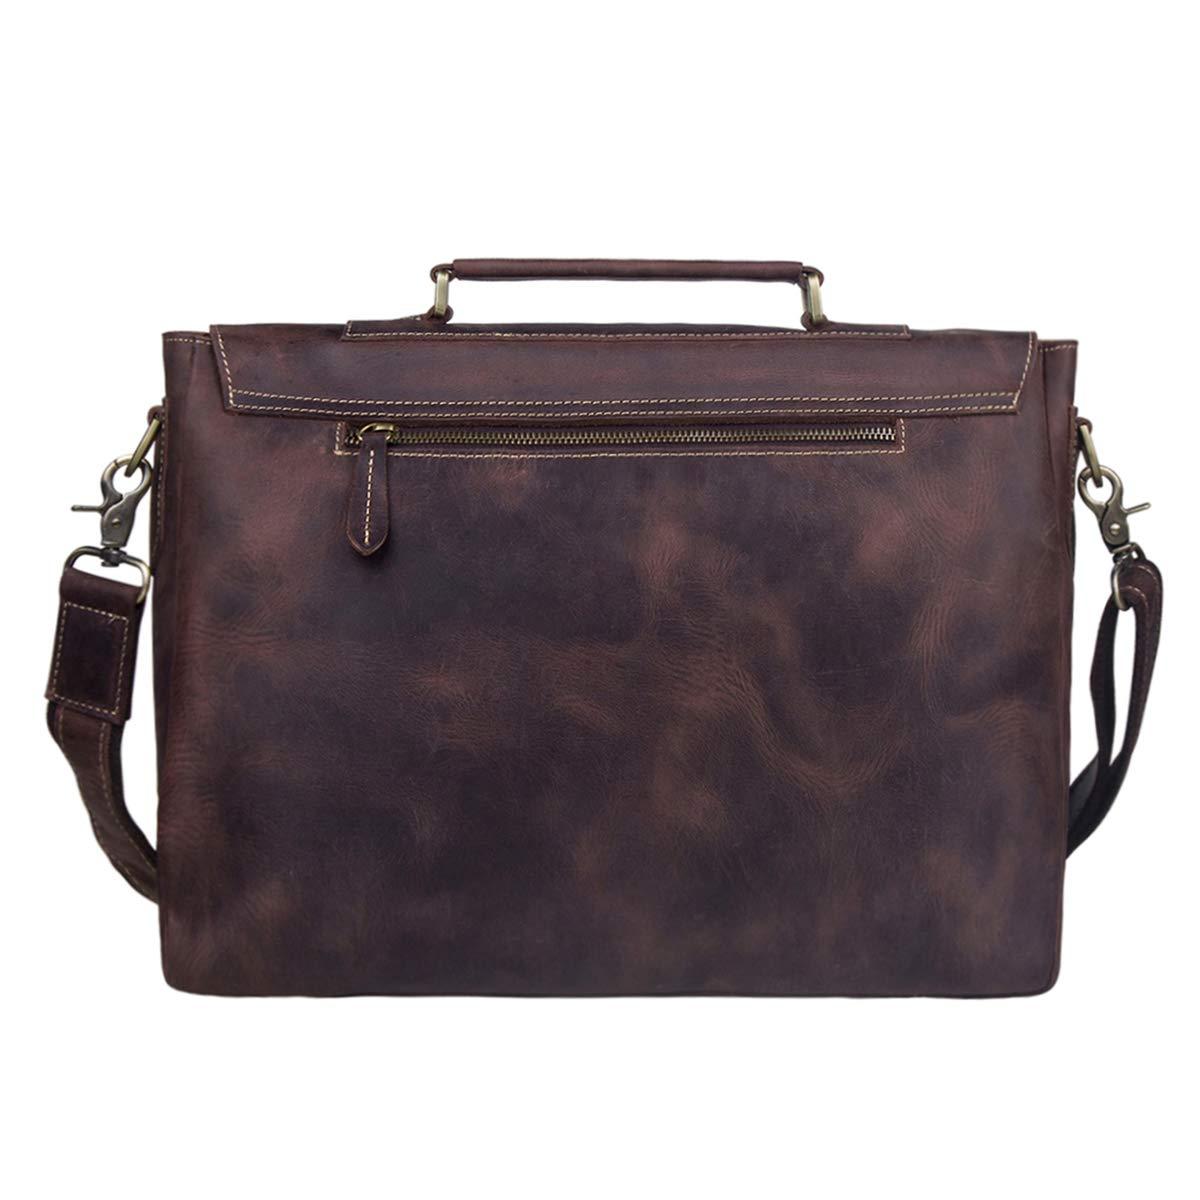 S-ZONE Men's Crazy Horse Leather Satchel Briefcase Shoulder Bag Messenger Bag 14'' Laptop Tote Bag by S-ZONE (Image #3)